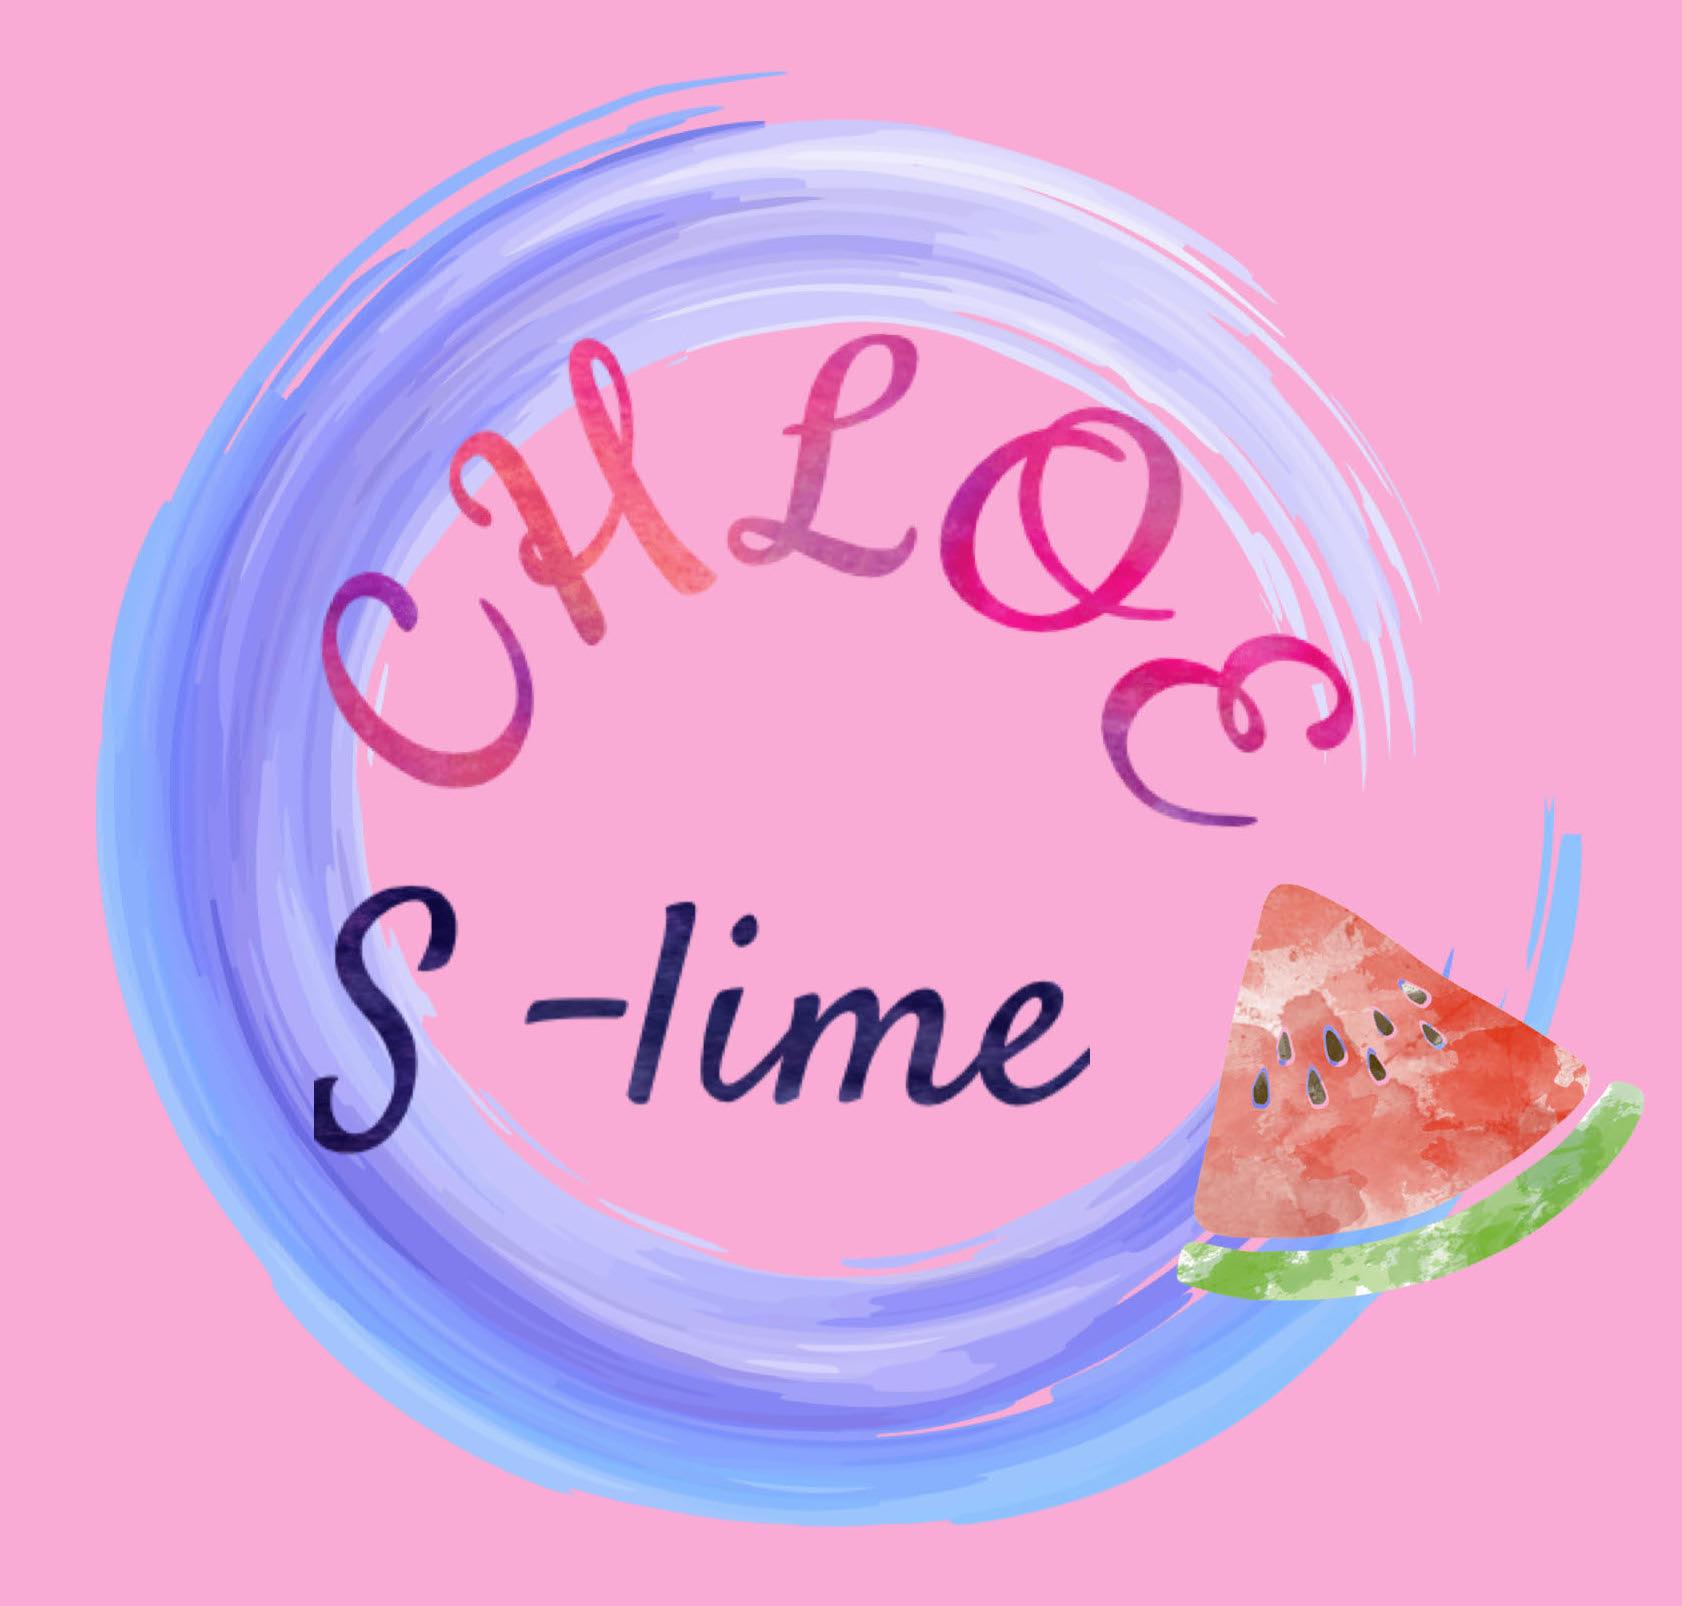 chloeslime Logo